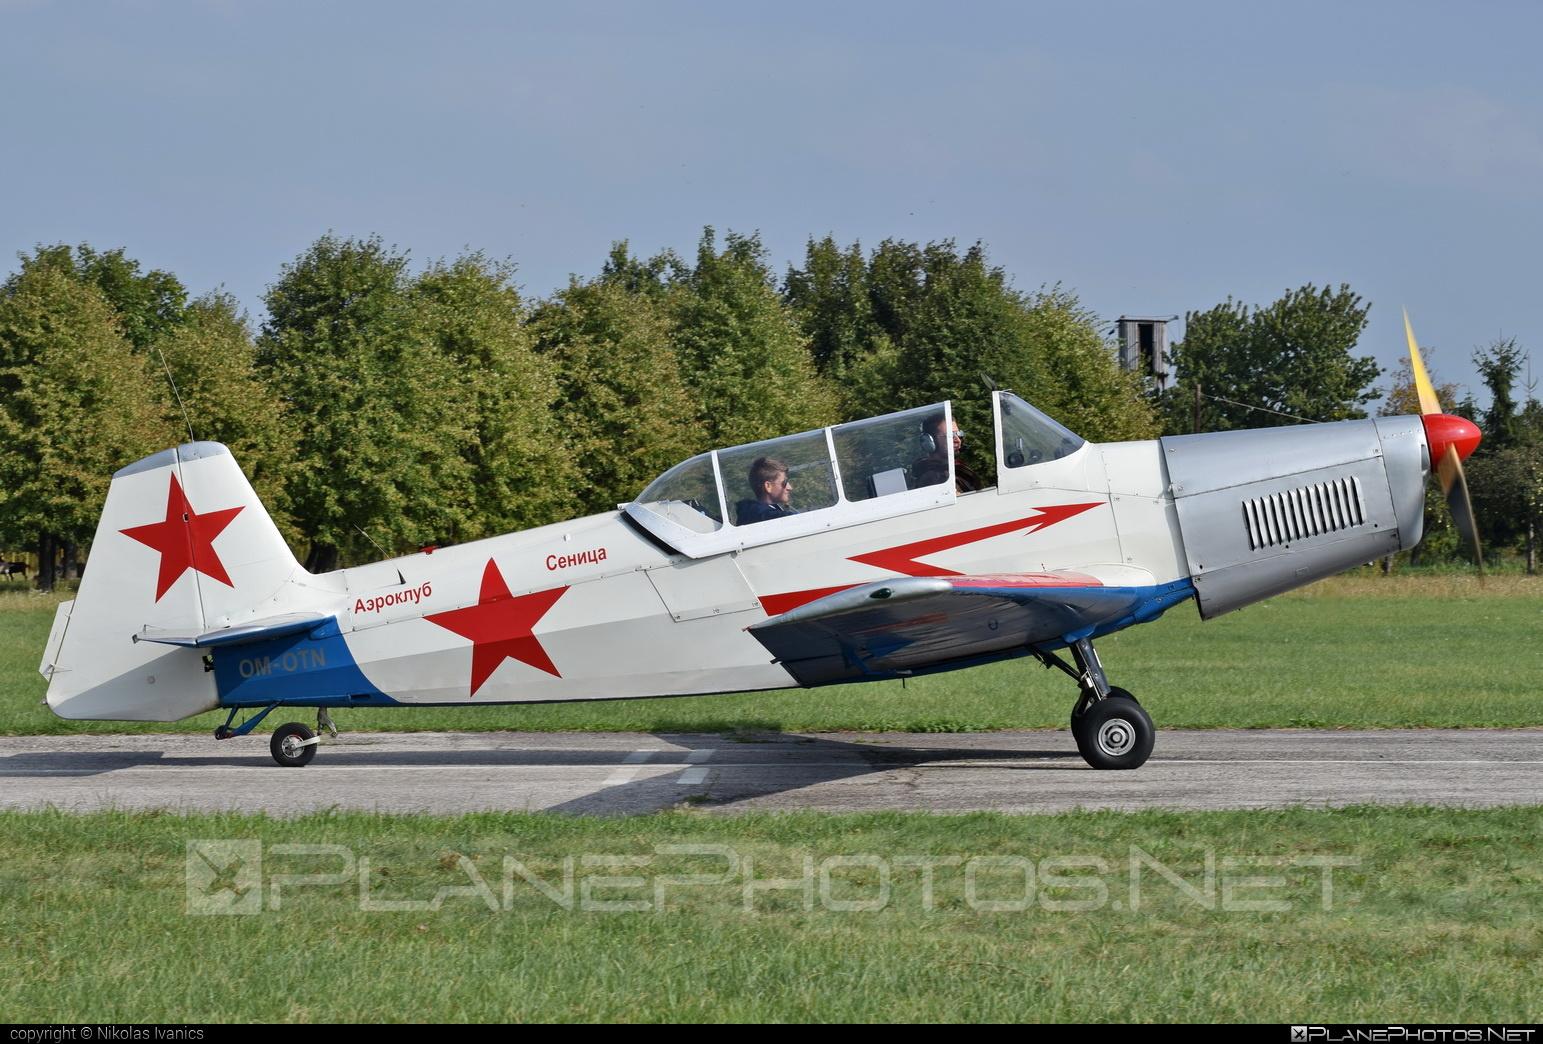 Zlin Z-326M Trenér Master - OM-OTN operated by Záhorácky aeroklub Senica #trenermaster #z326 #z326trenermaster #zlin #zlin326